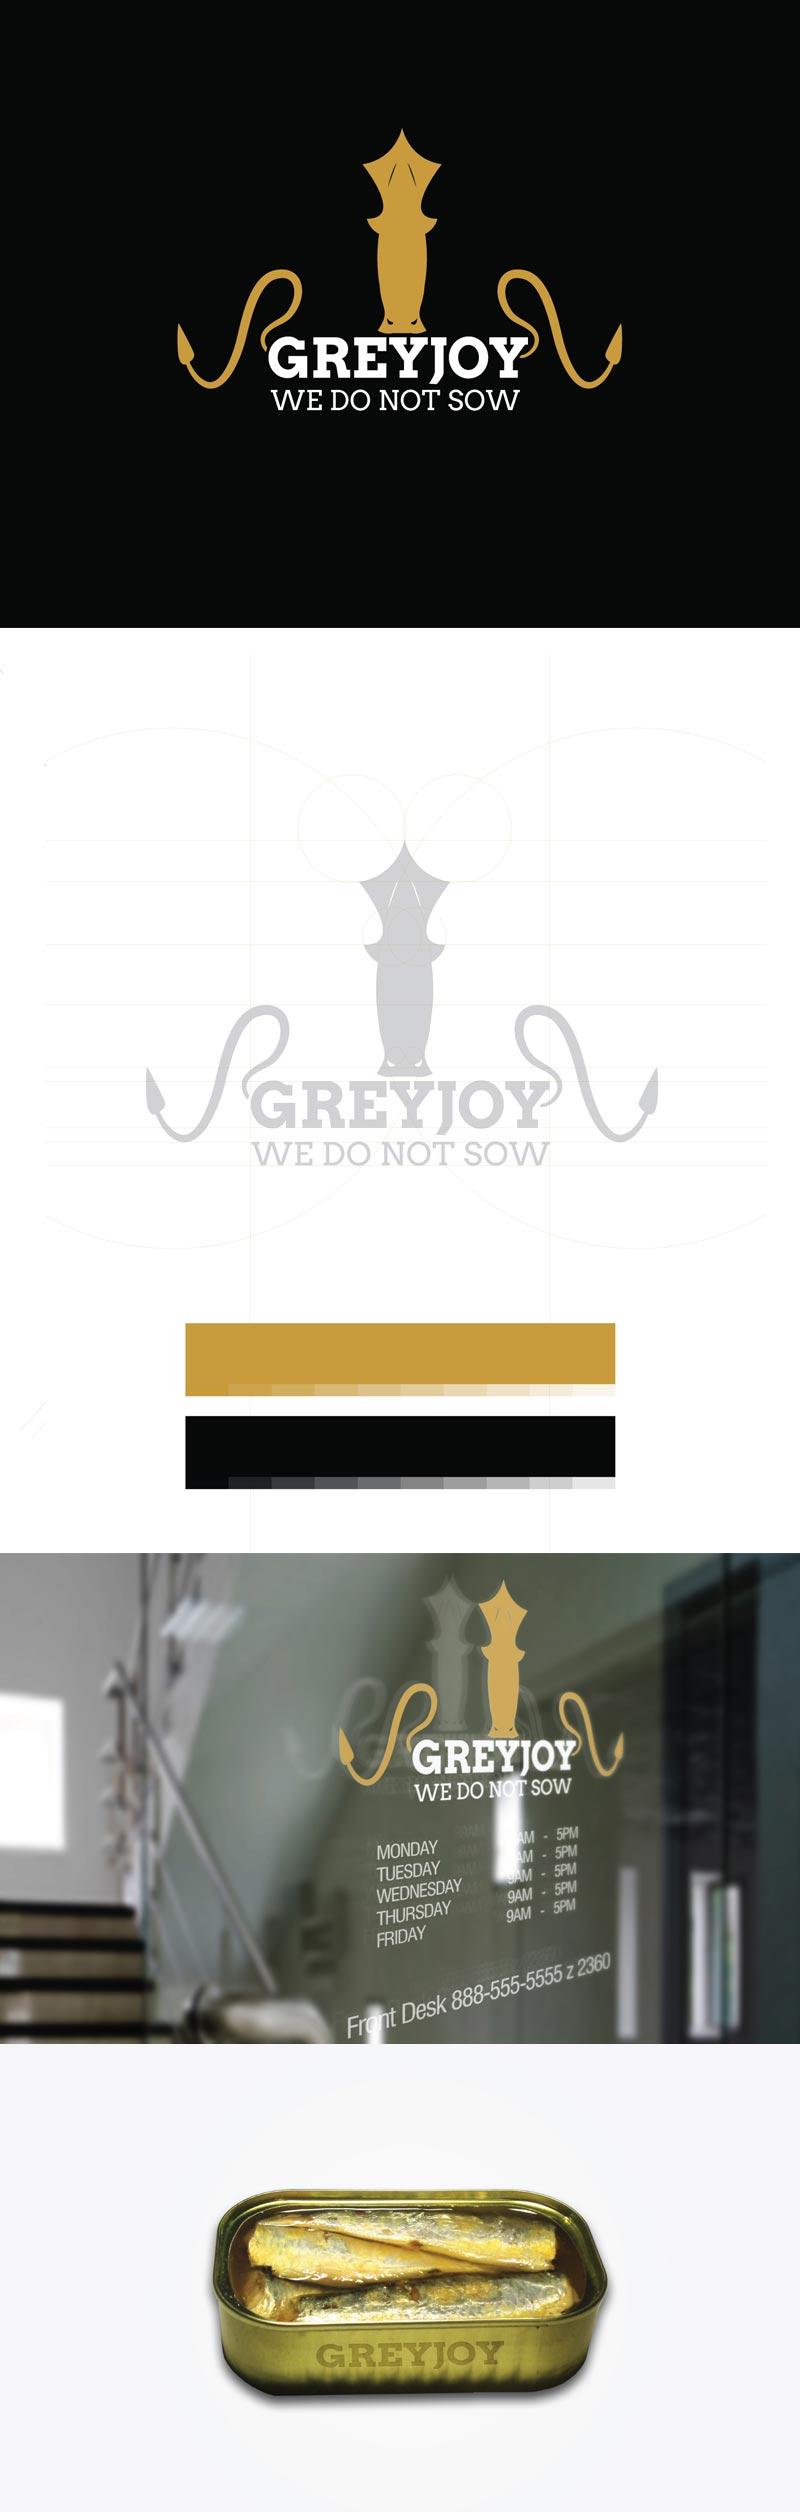 Greyjoy Canned Fish